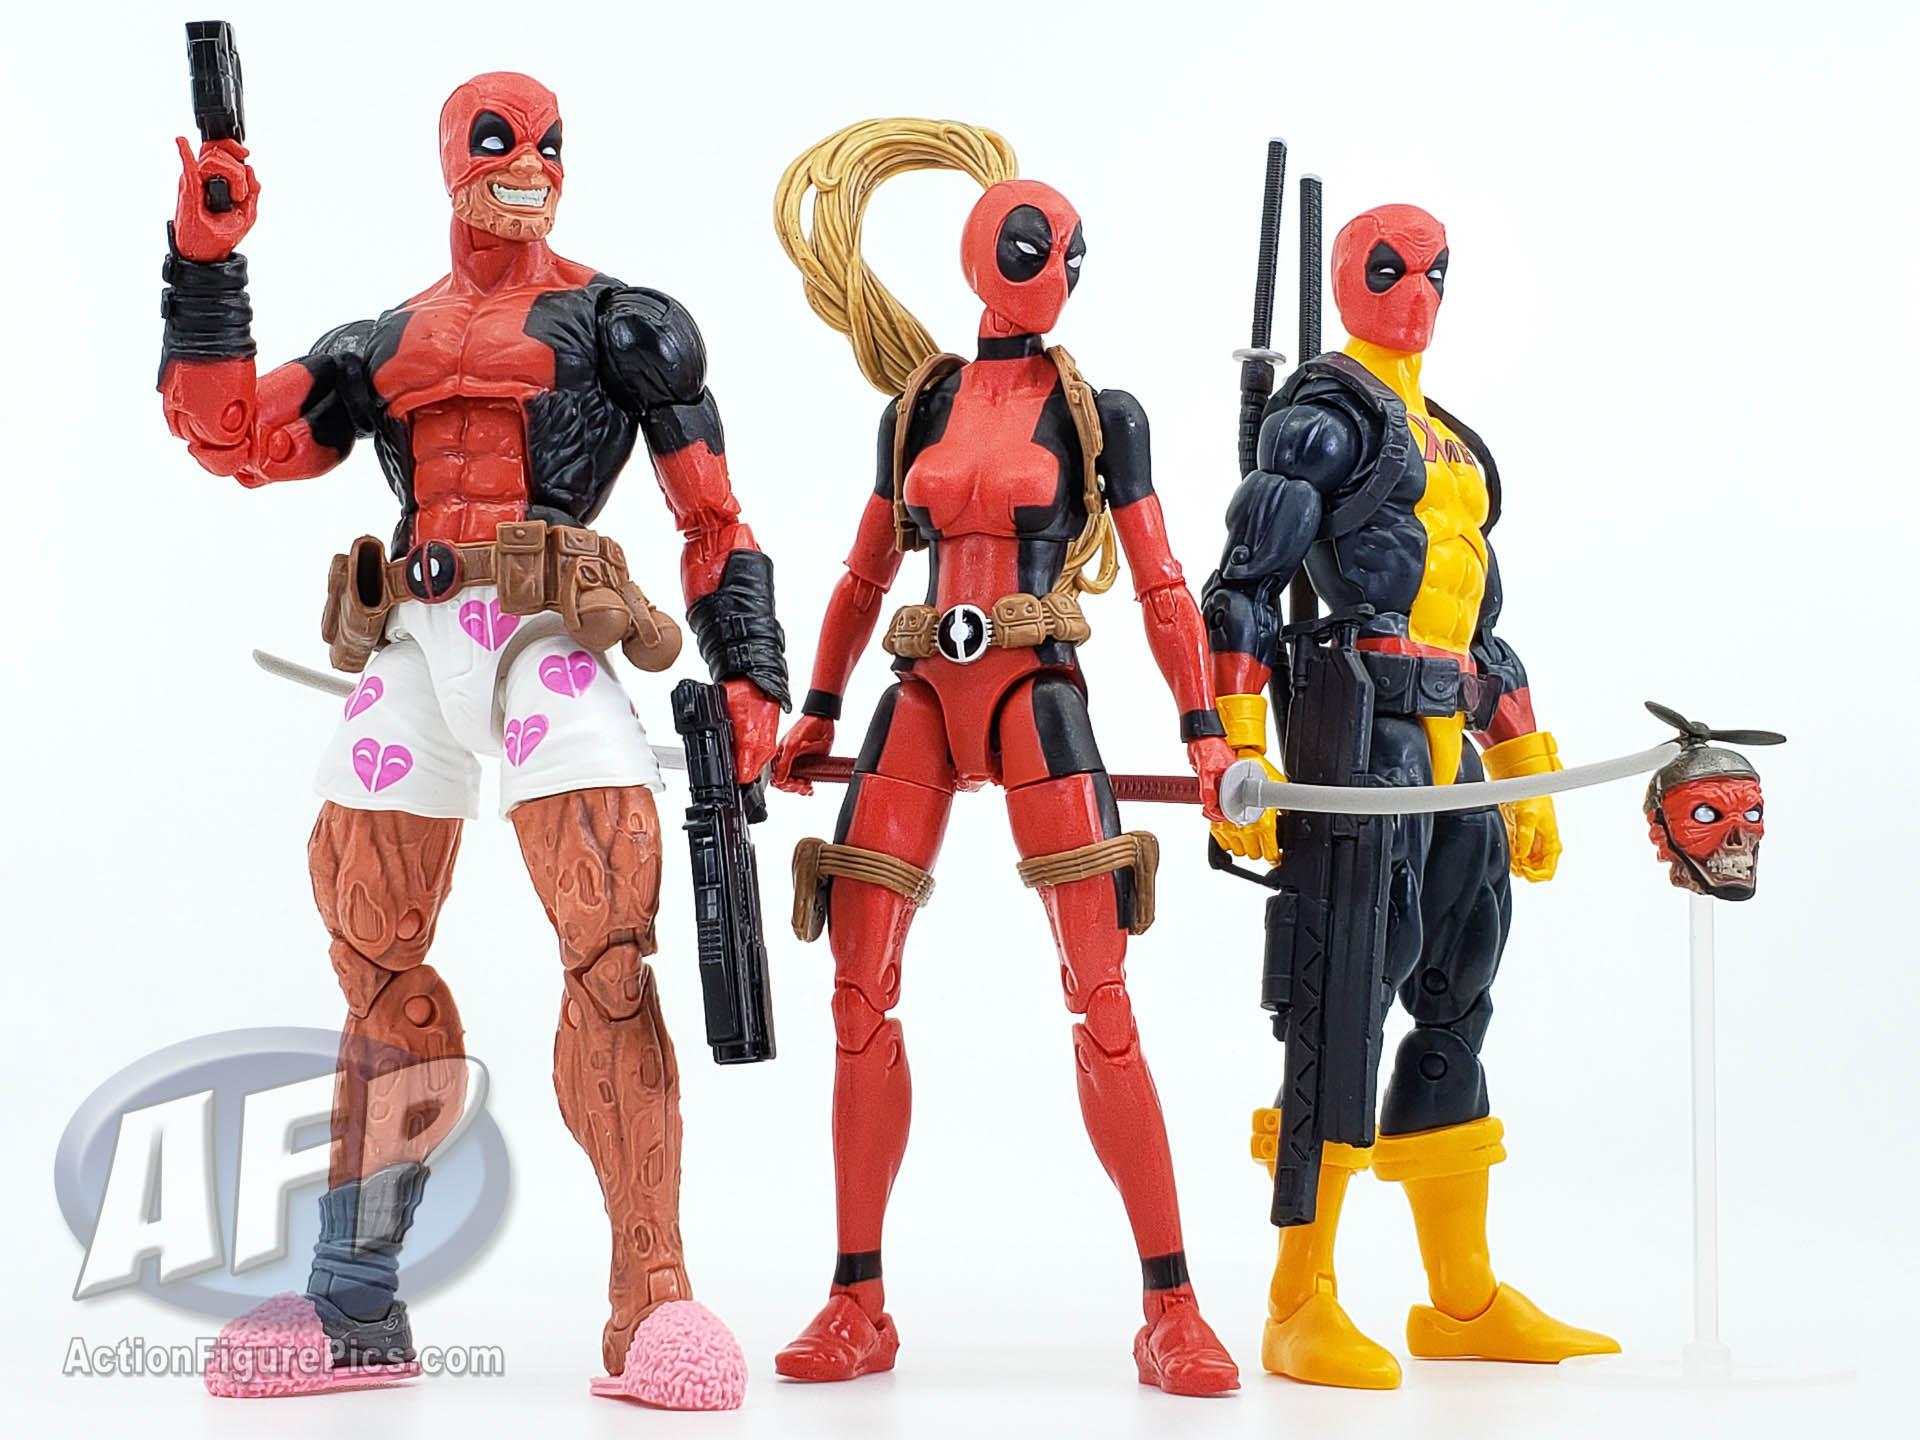 Marvel Legends X-Men Deadpool Madcap Wave 2 6-Inch Figure